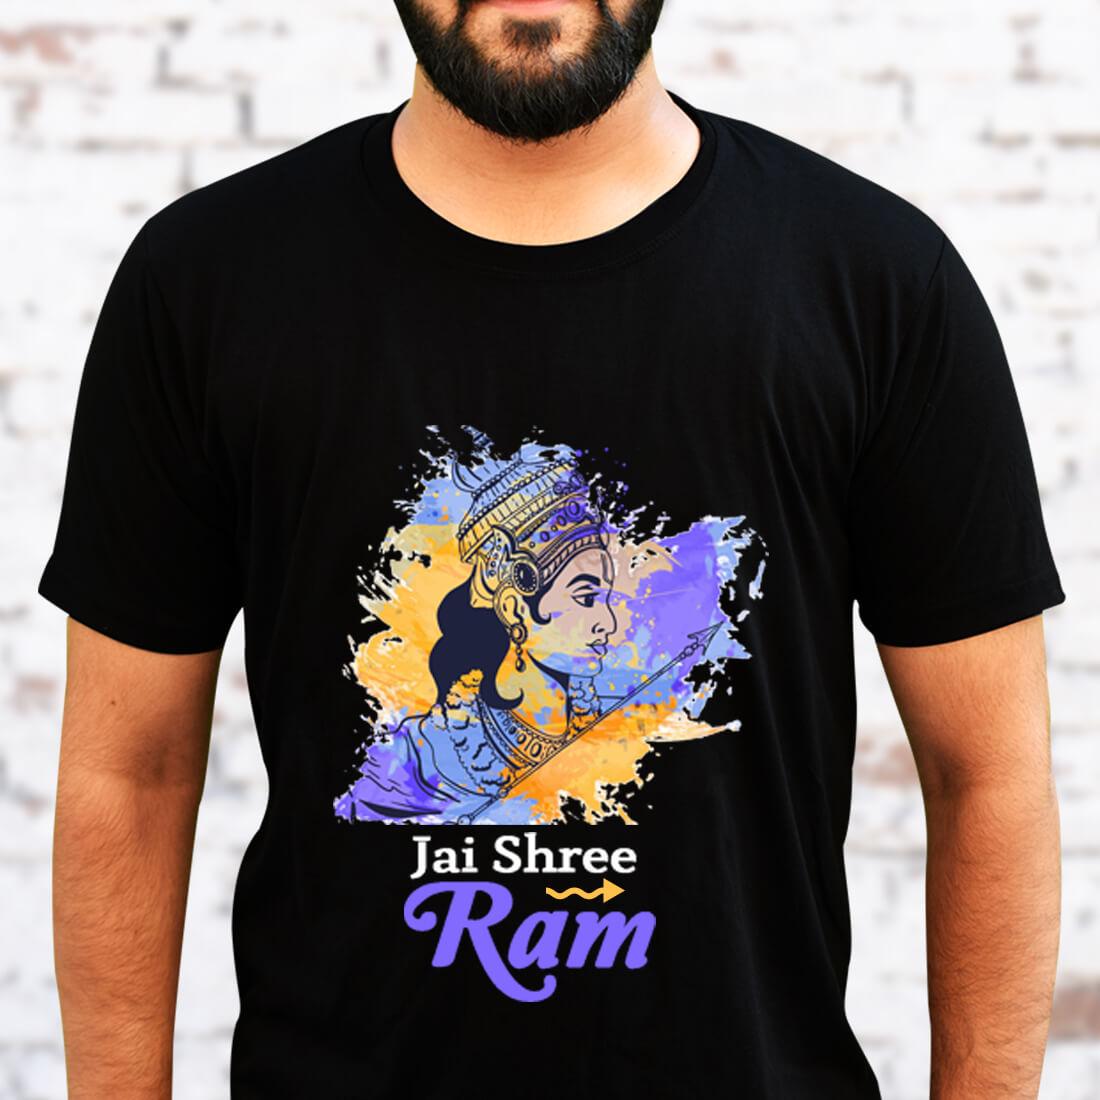 Jai Shree Ram Printed Black T Shirt Men